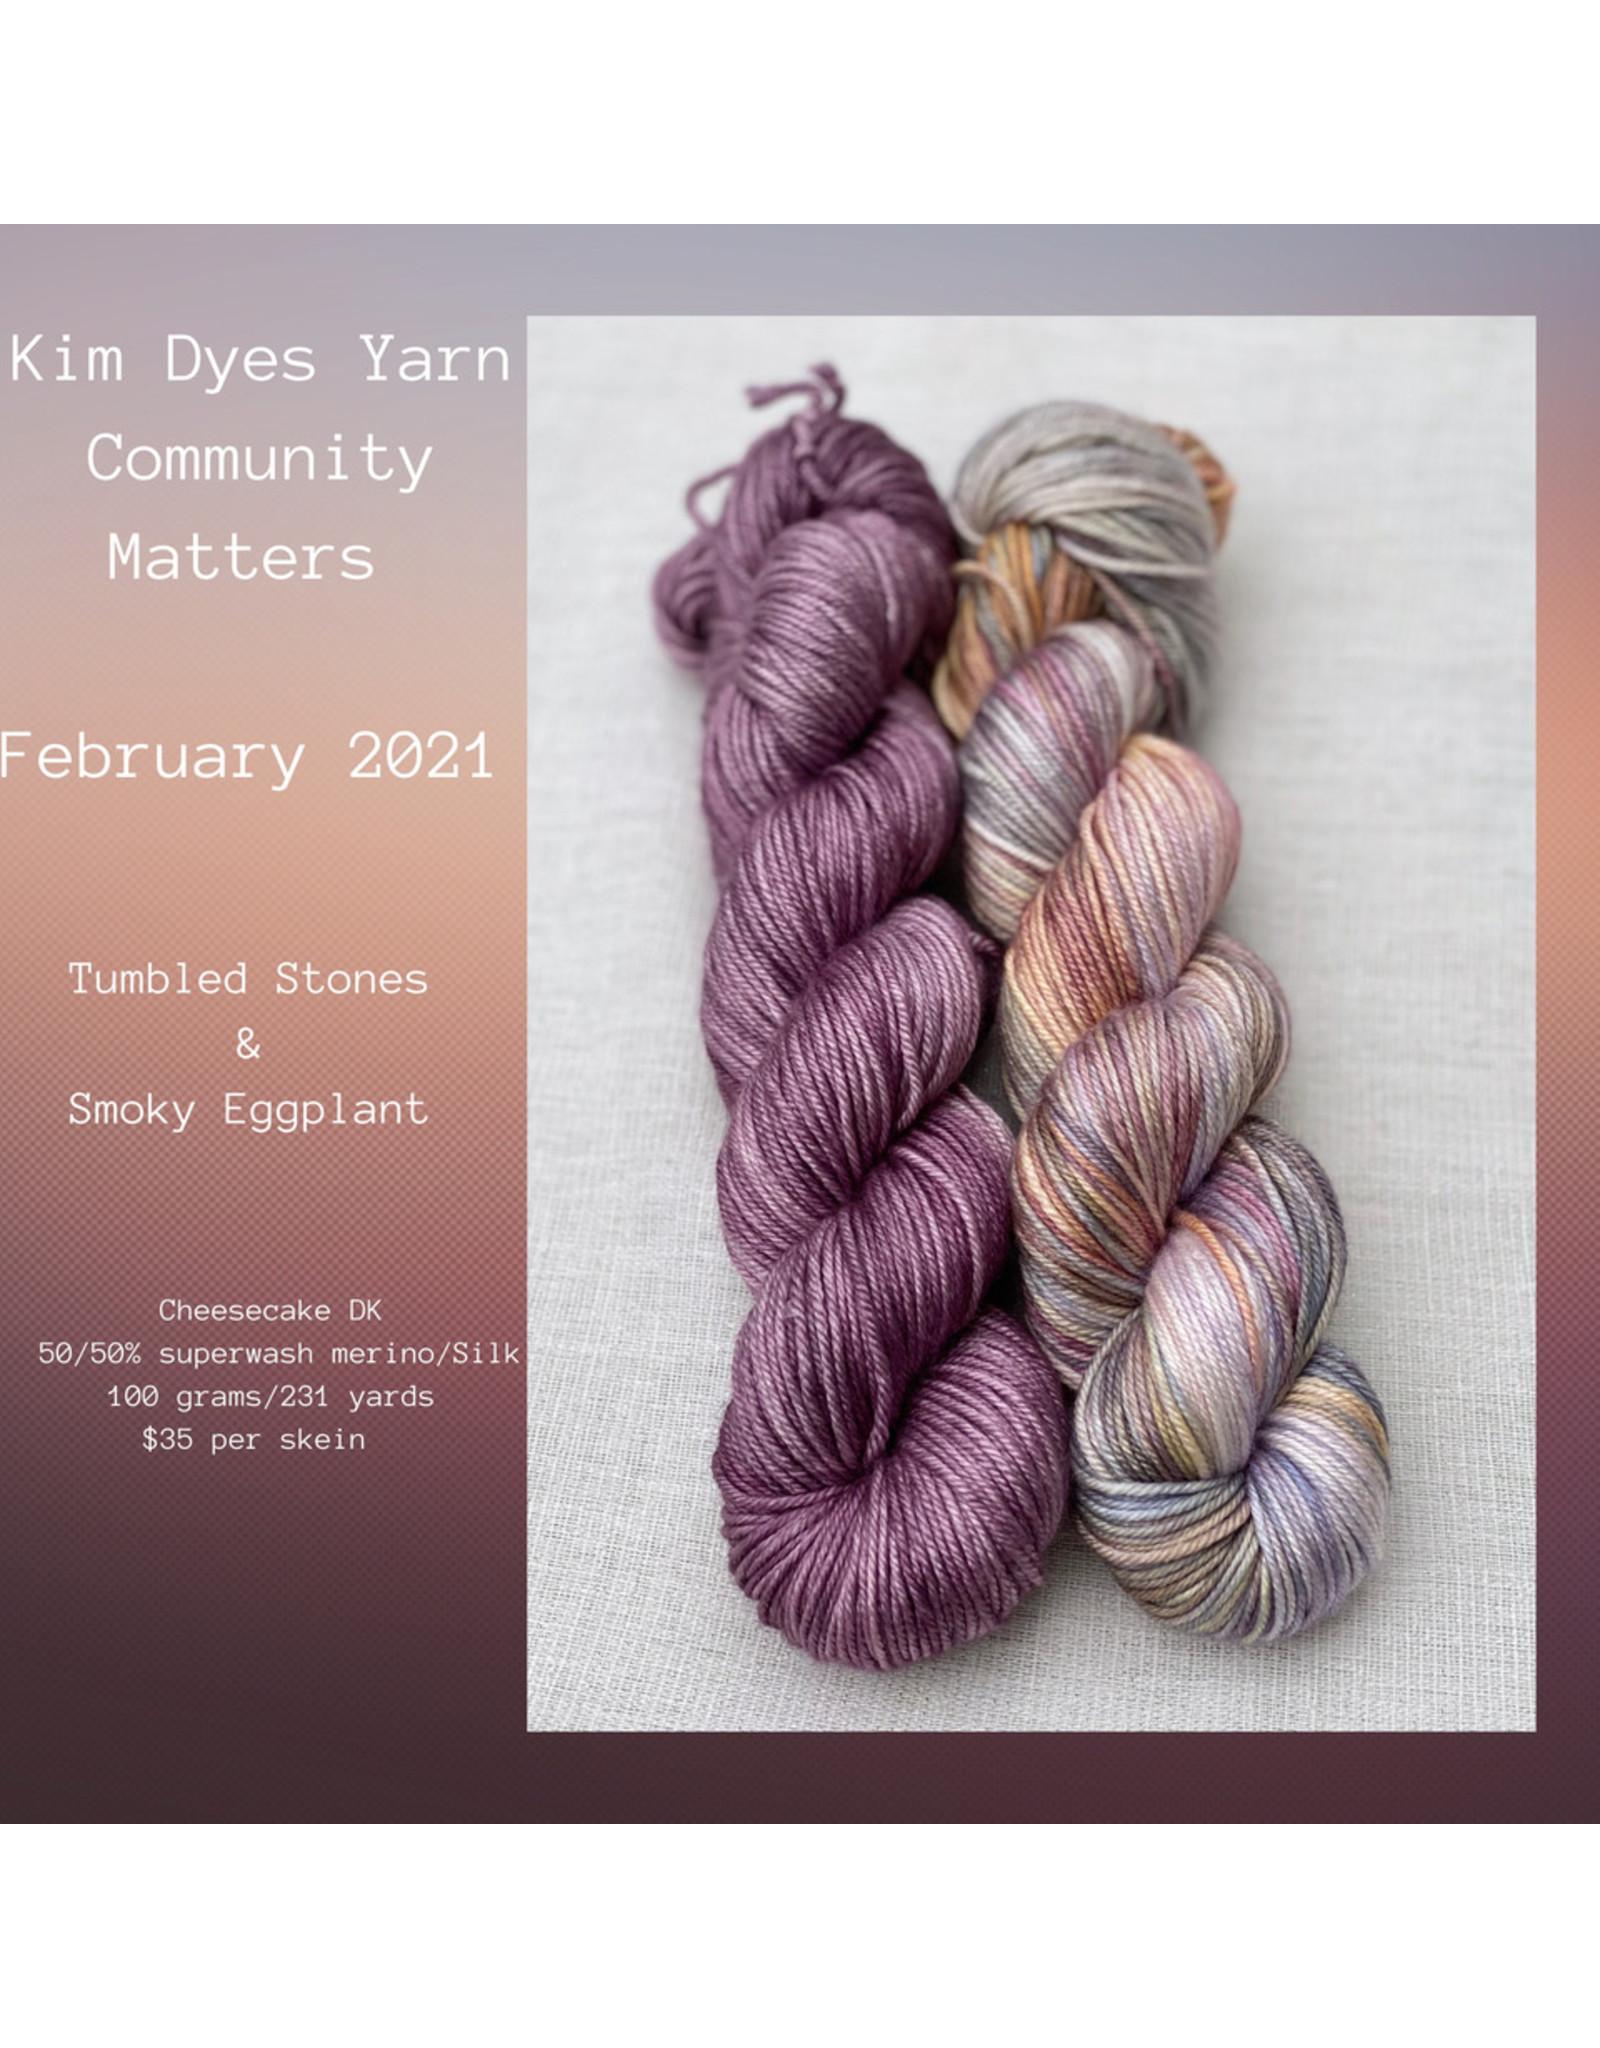 Kim Dyes Yarns Cheesecake DK